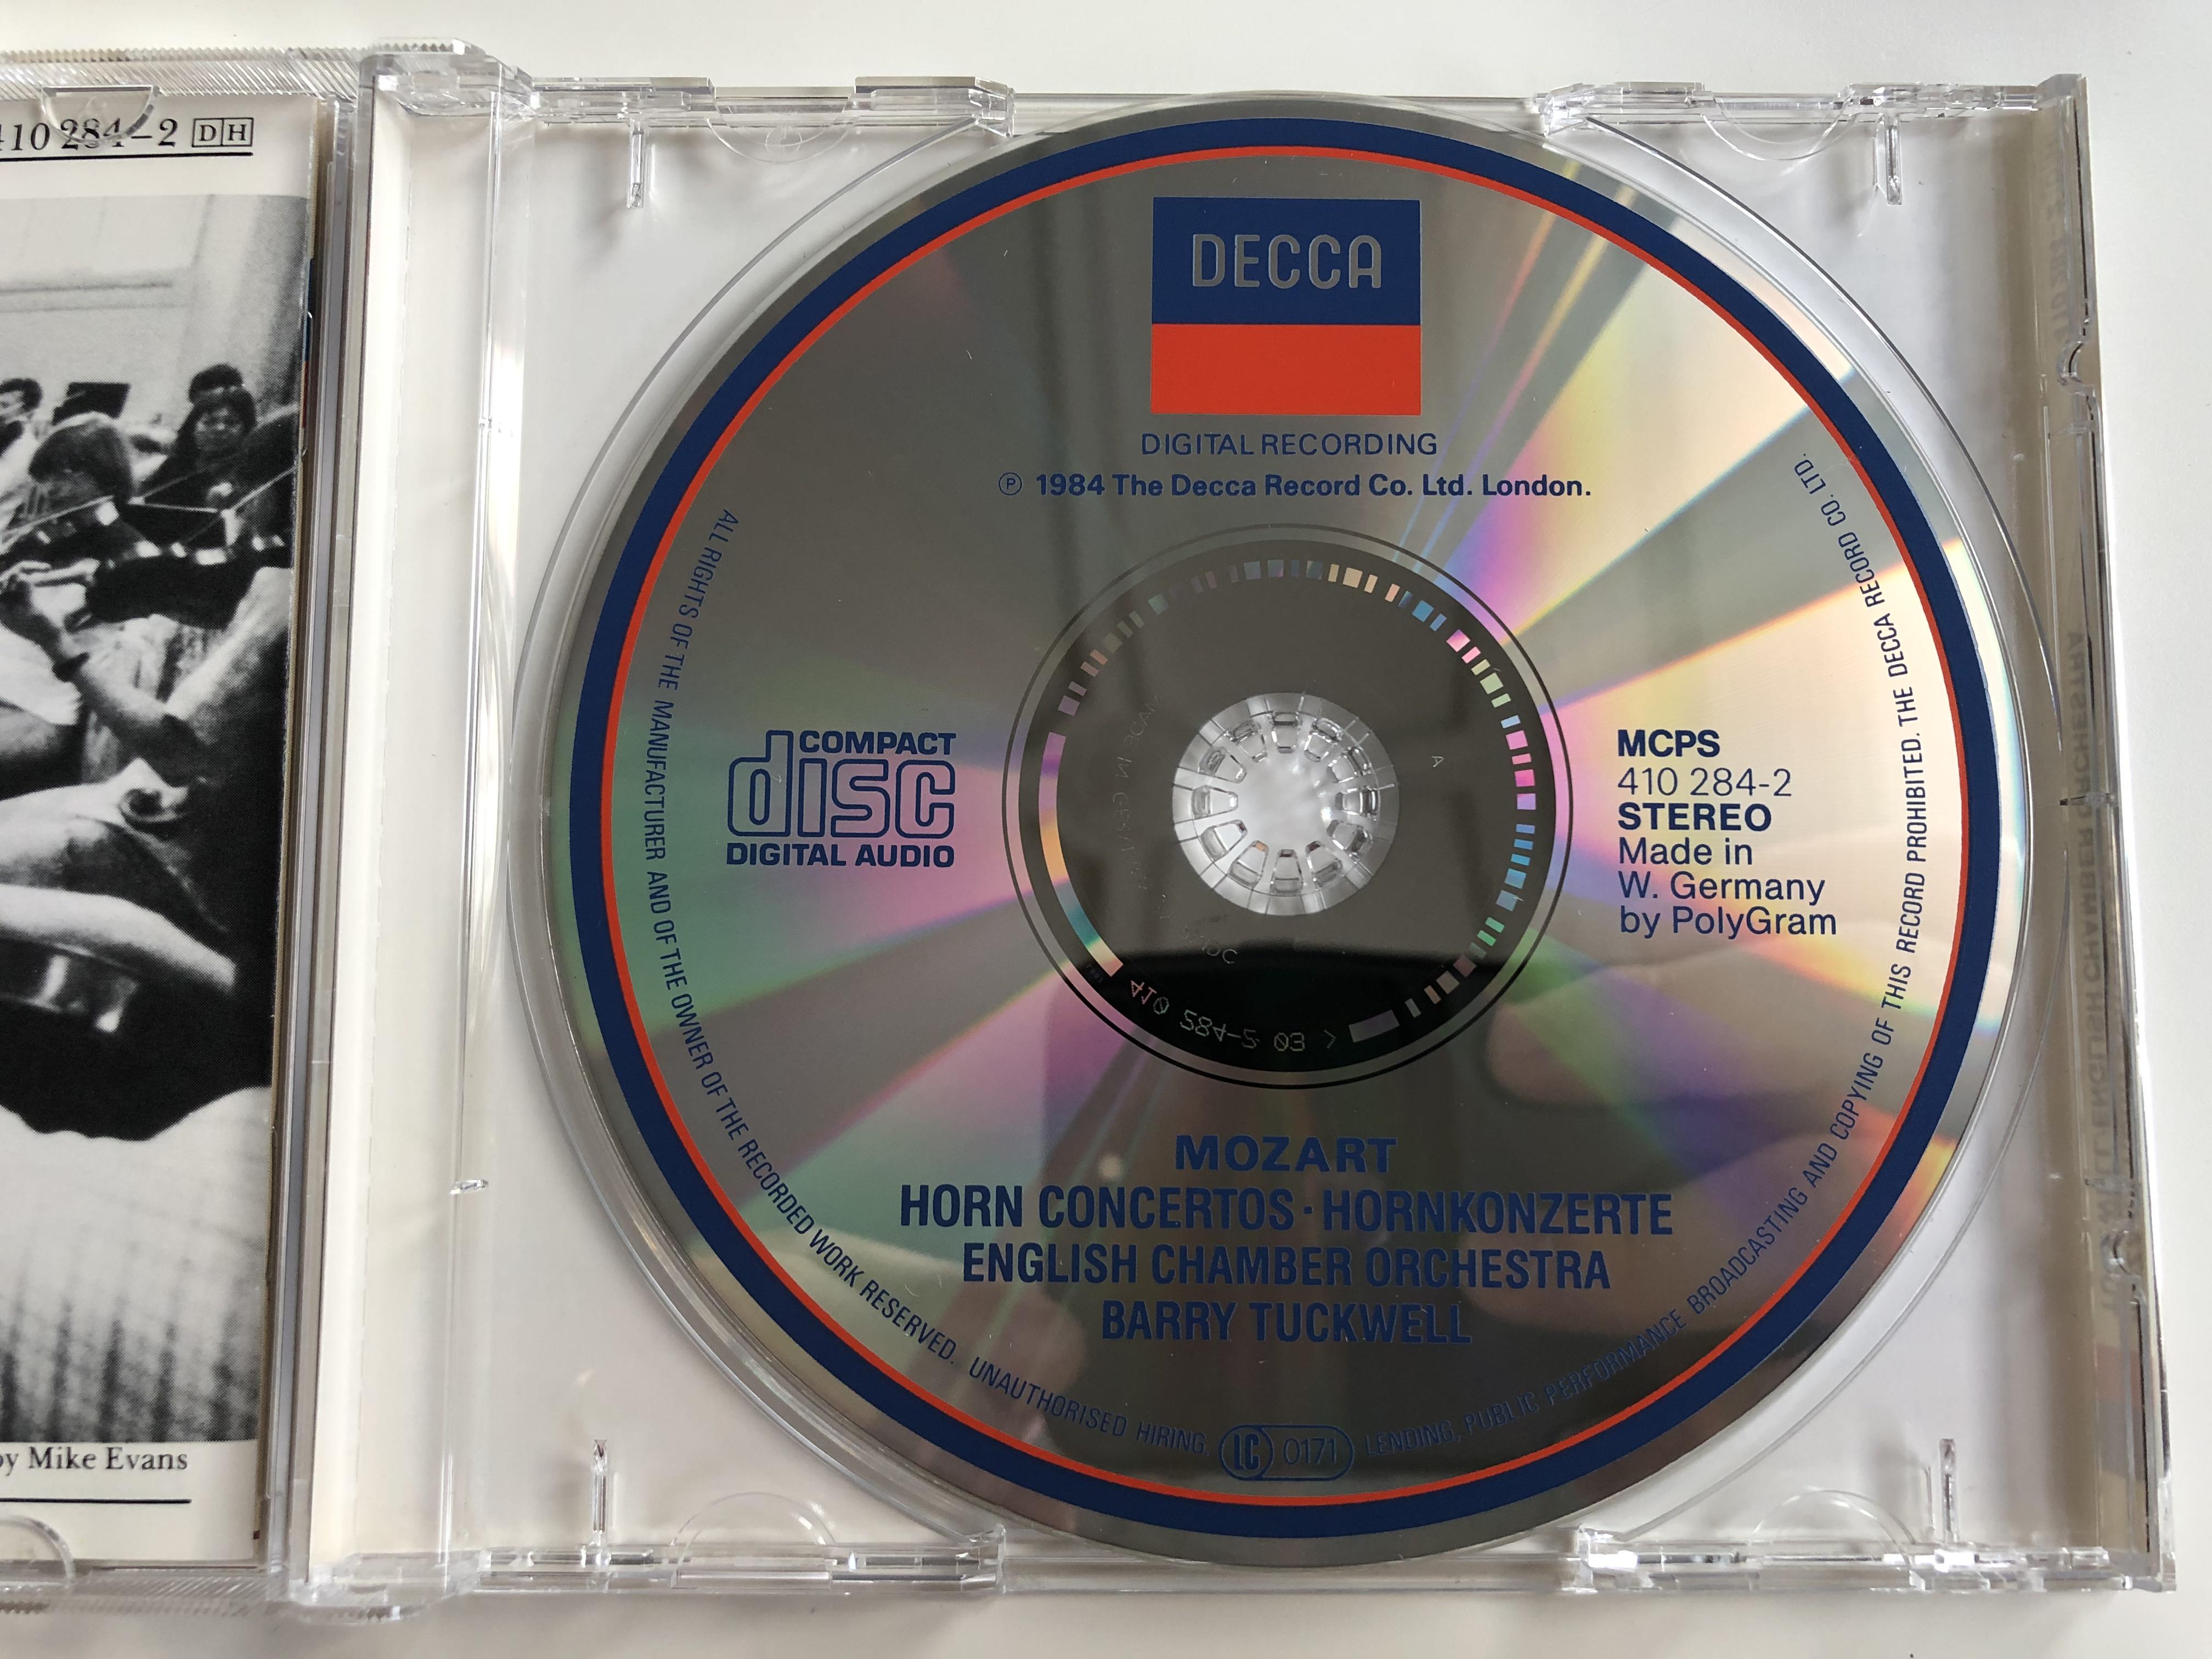 mozart-horn-concertos-concertos-pour-cor-hornkonzerte-nos.-1-4-barry-tuckwell-english-chamber-orchestra-decca-audio-cd-1984-stereo-410-284-2-7-.jpg